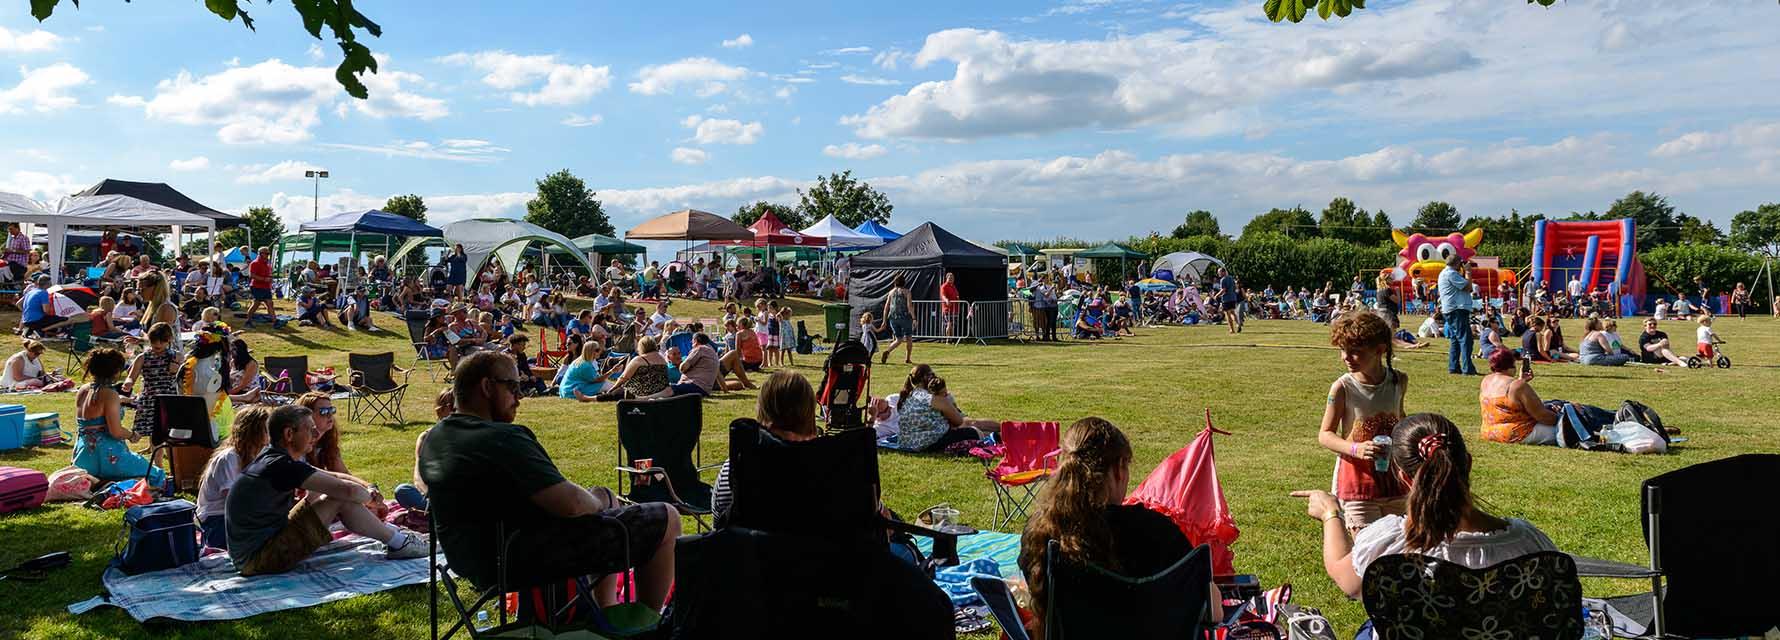 image of everyone enjoying the sunshine at Pattishall Picnic in the Park